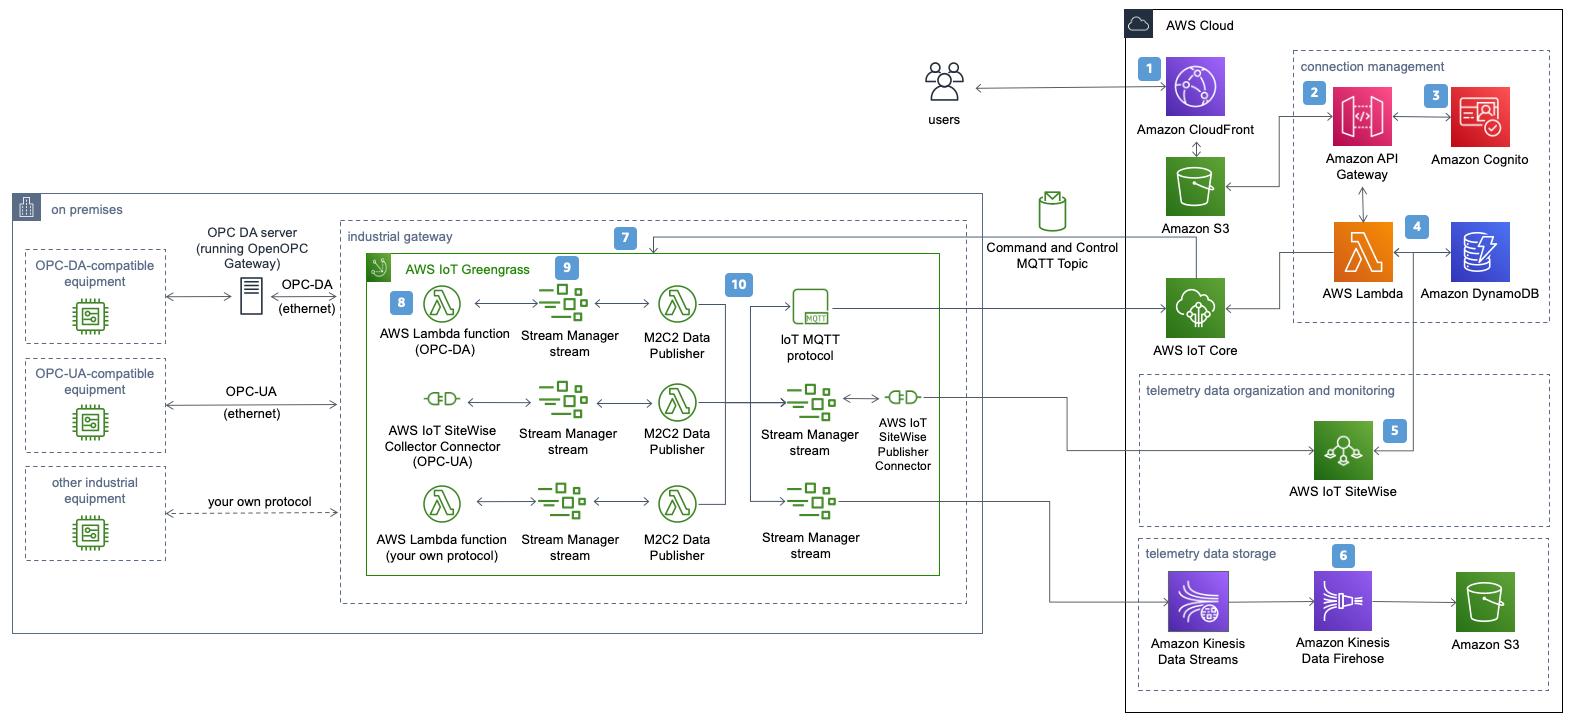 Figure 4. Machine to Cloud Connectivity (M2C2) Framework architecture